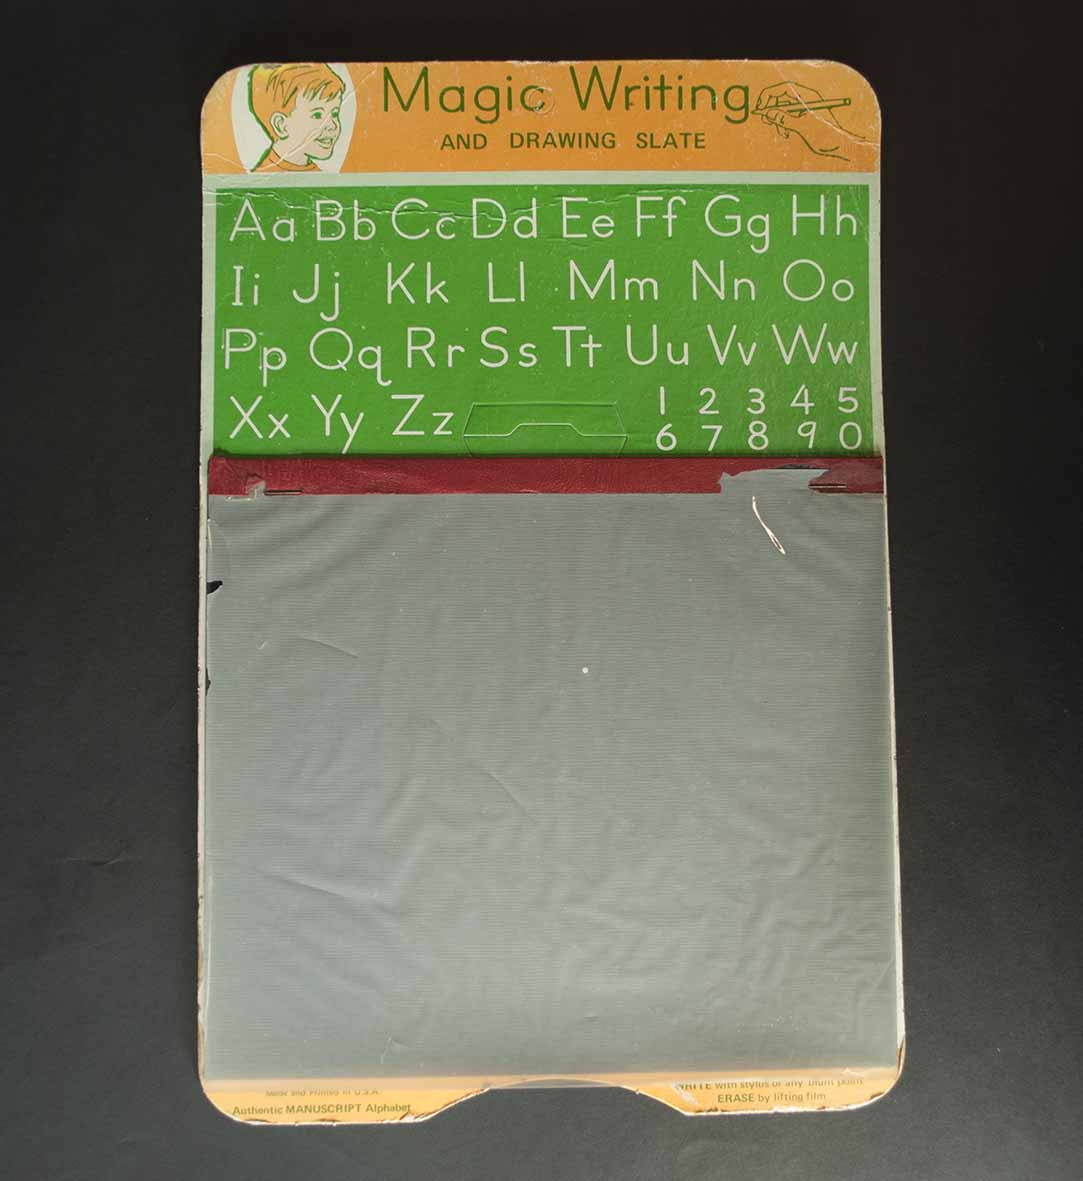 Magic Writing and Drawing Slate